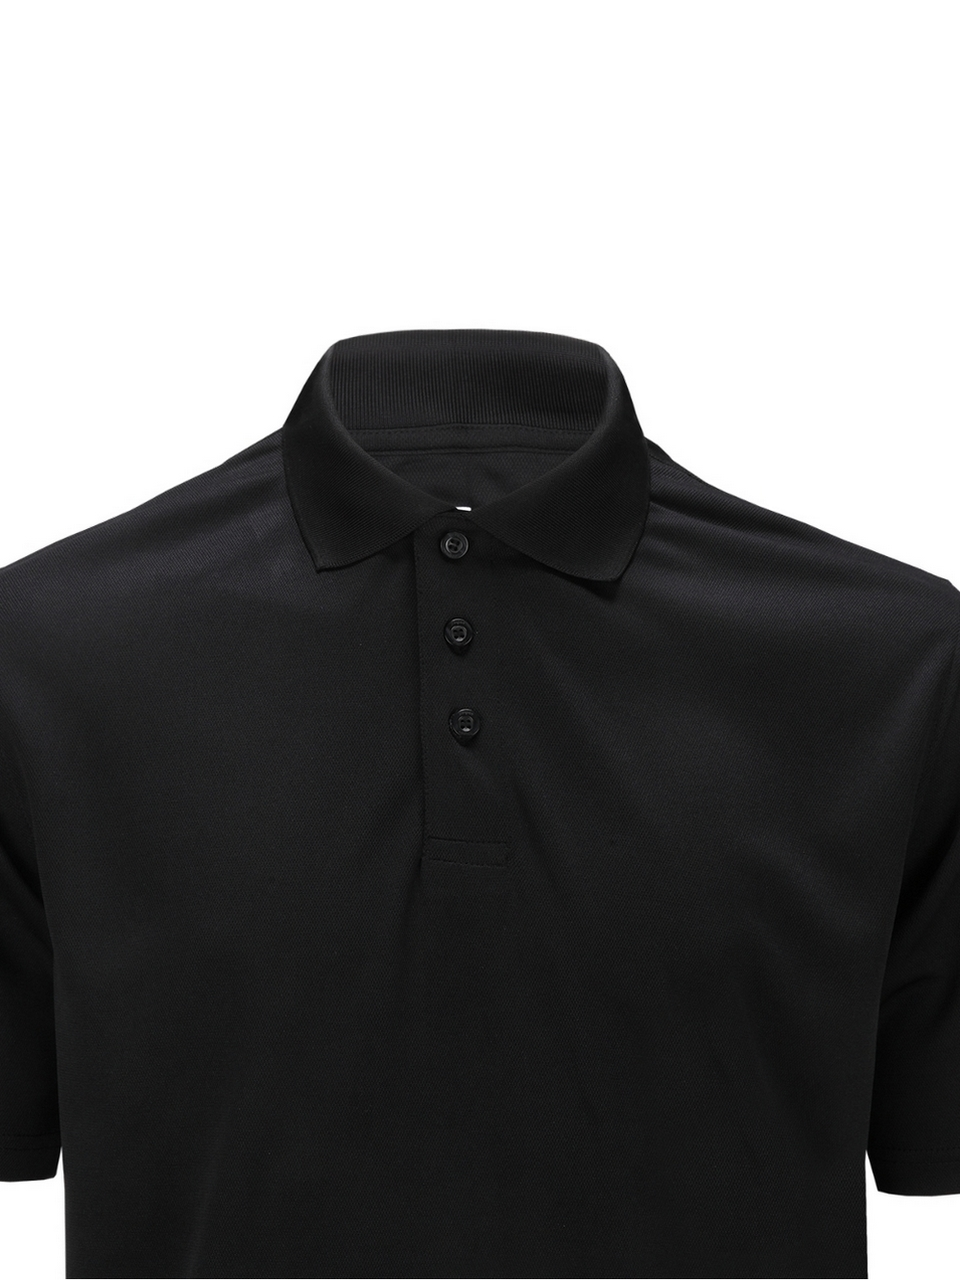 d775e84fc Forgan of St Andrews Premium Performance Golf Polo Shirts 3 Pack - Mens -  Walmart.com